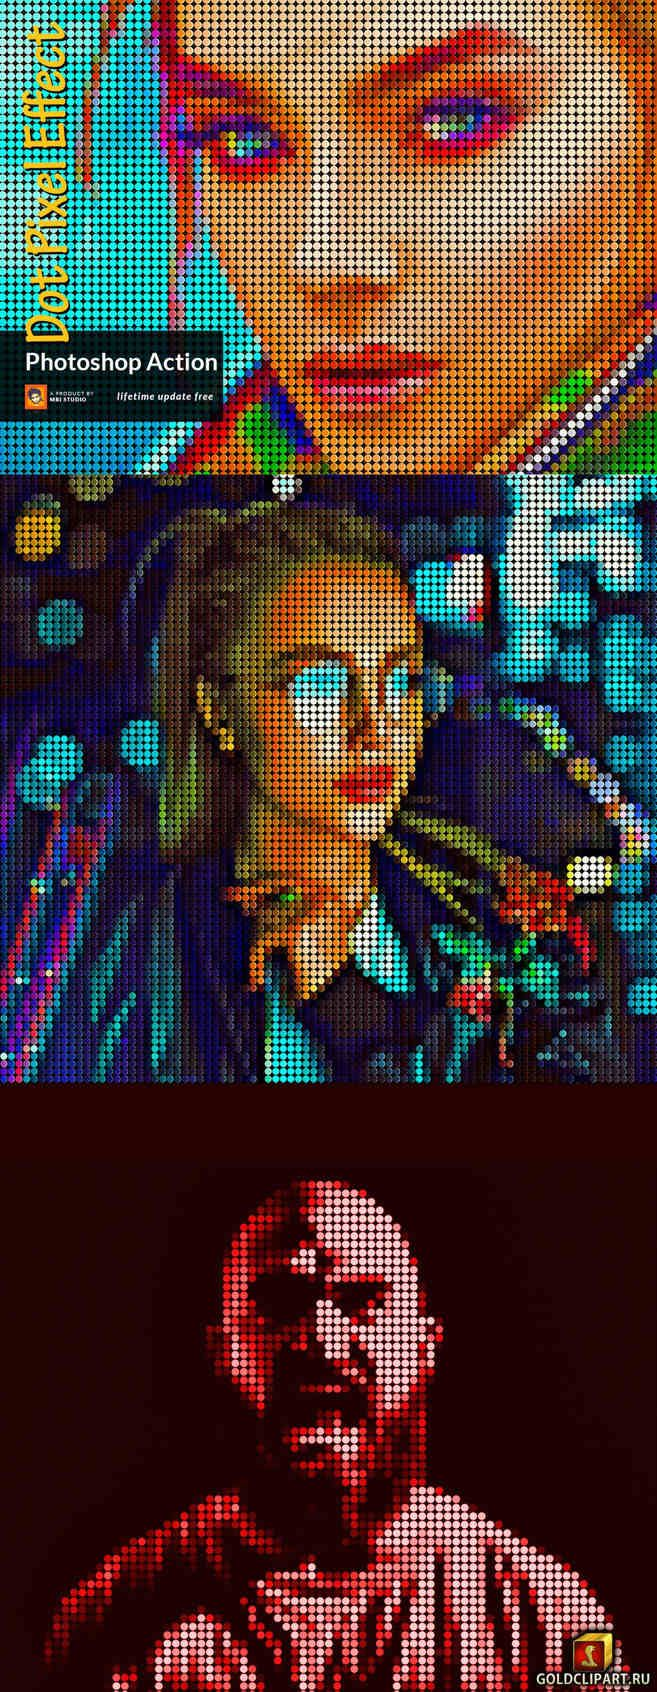 Punktpixel-Effekt Photoshop-Aktion 3732588 • Goldclipart.ru